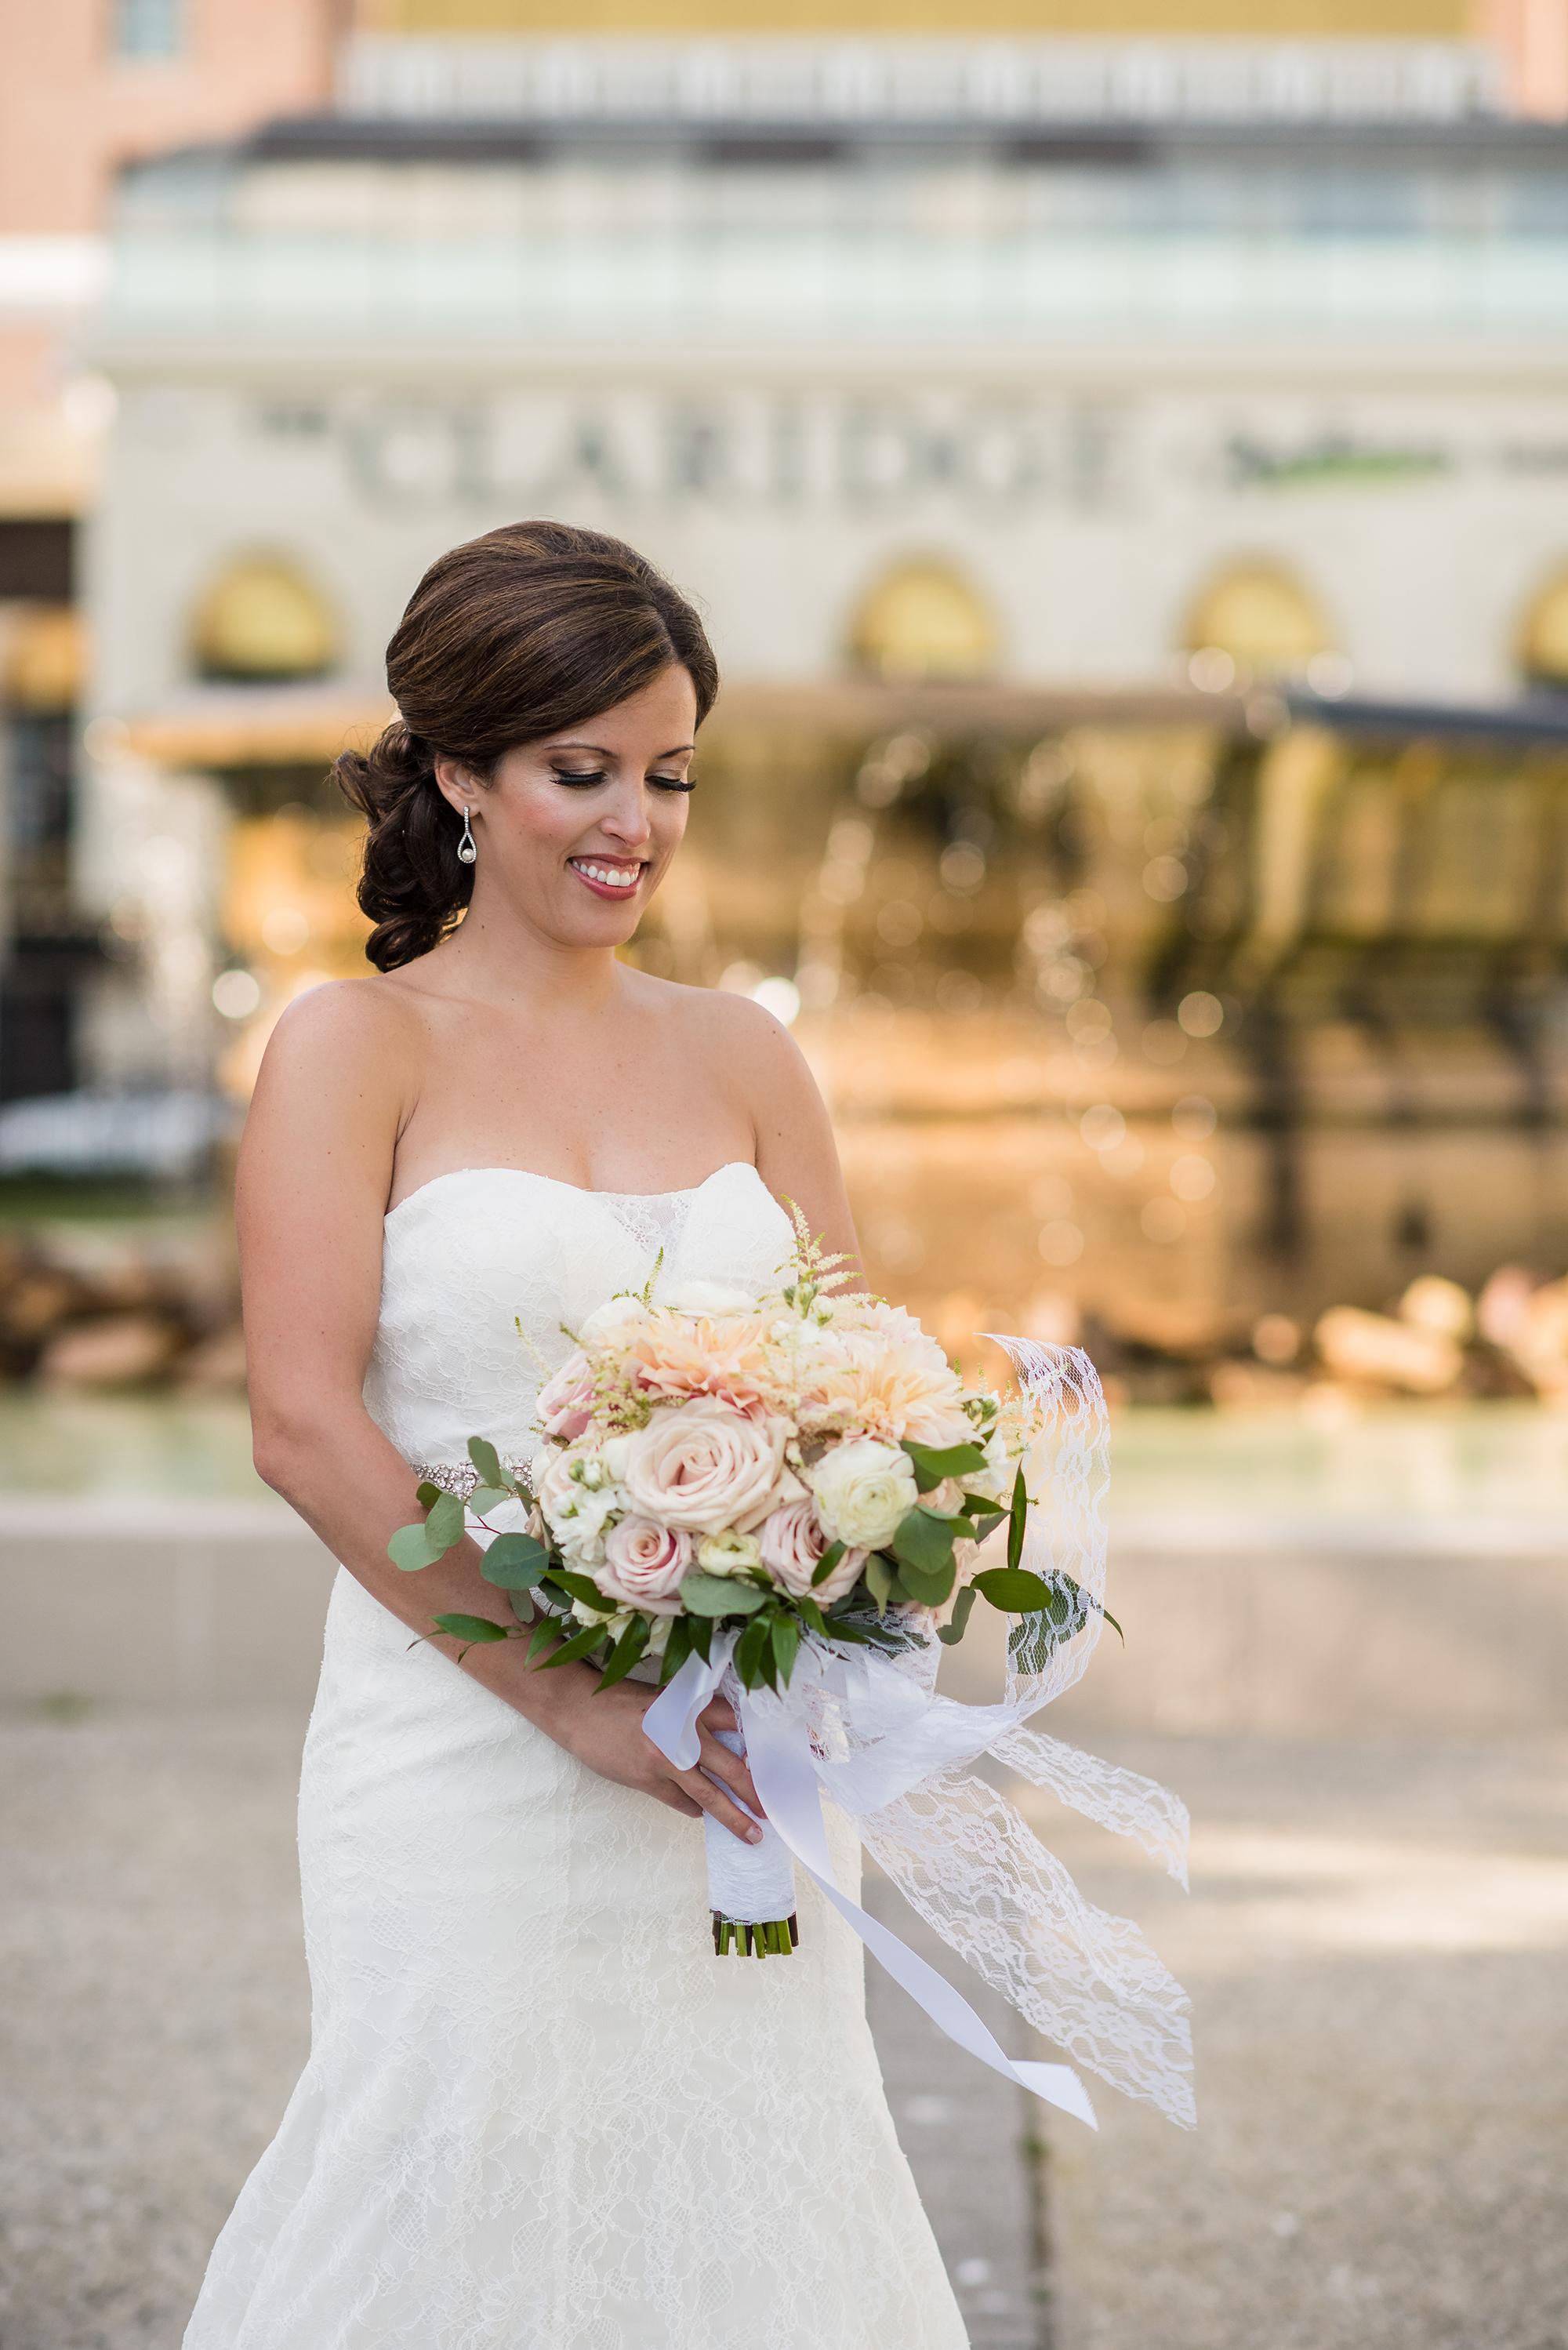 lbi-photographer-ac-wedding-claridge-val-15.jpg